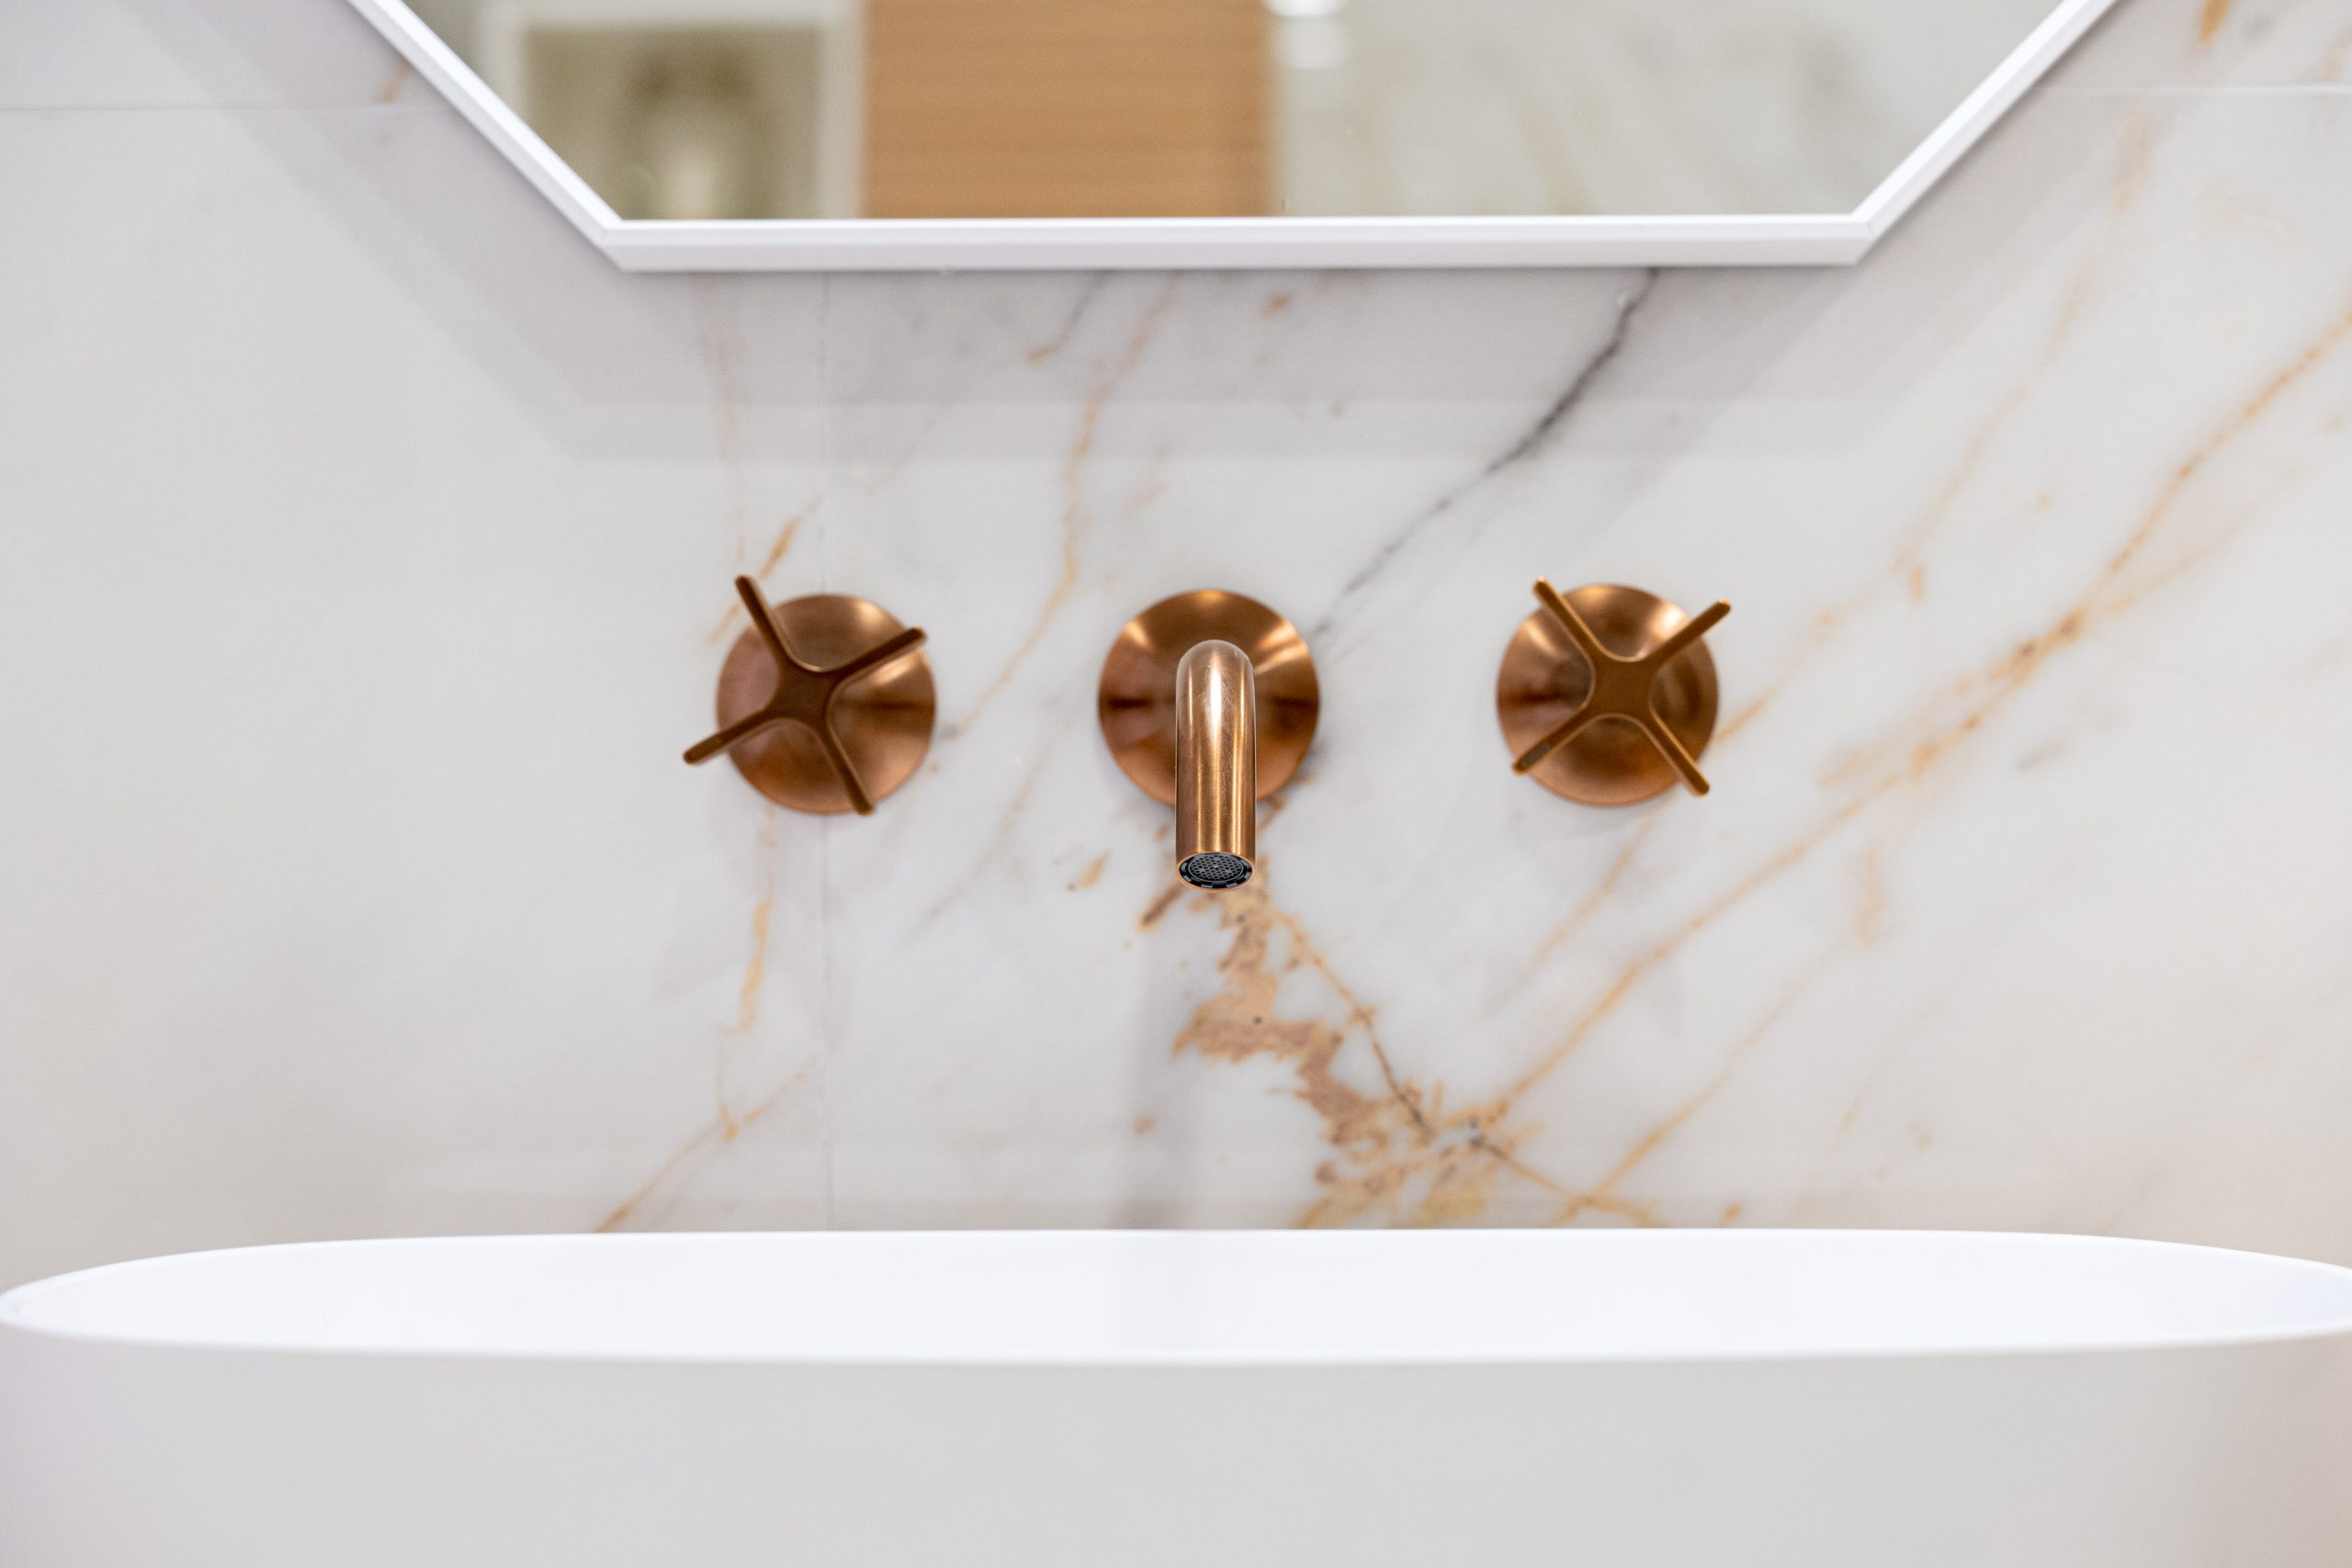 ensemble salle de bain robinet doré